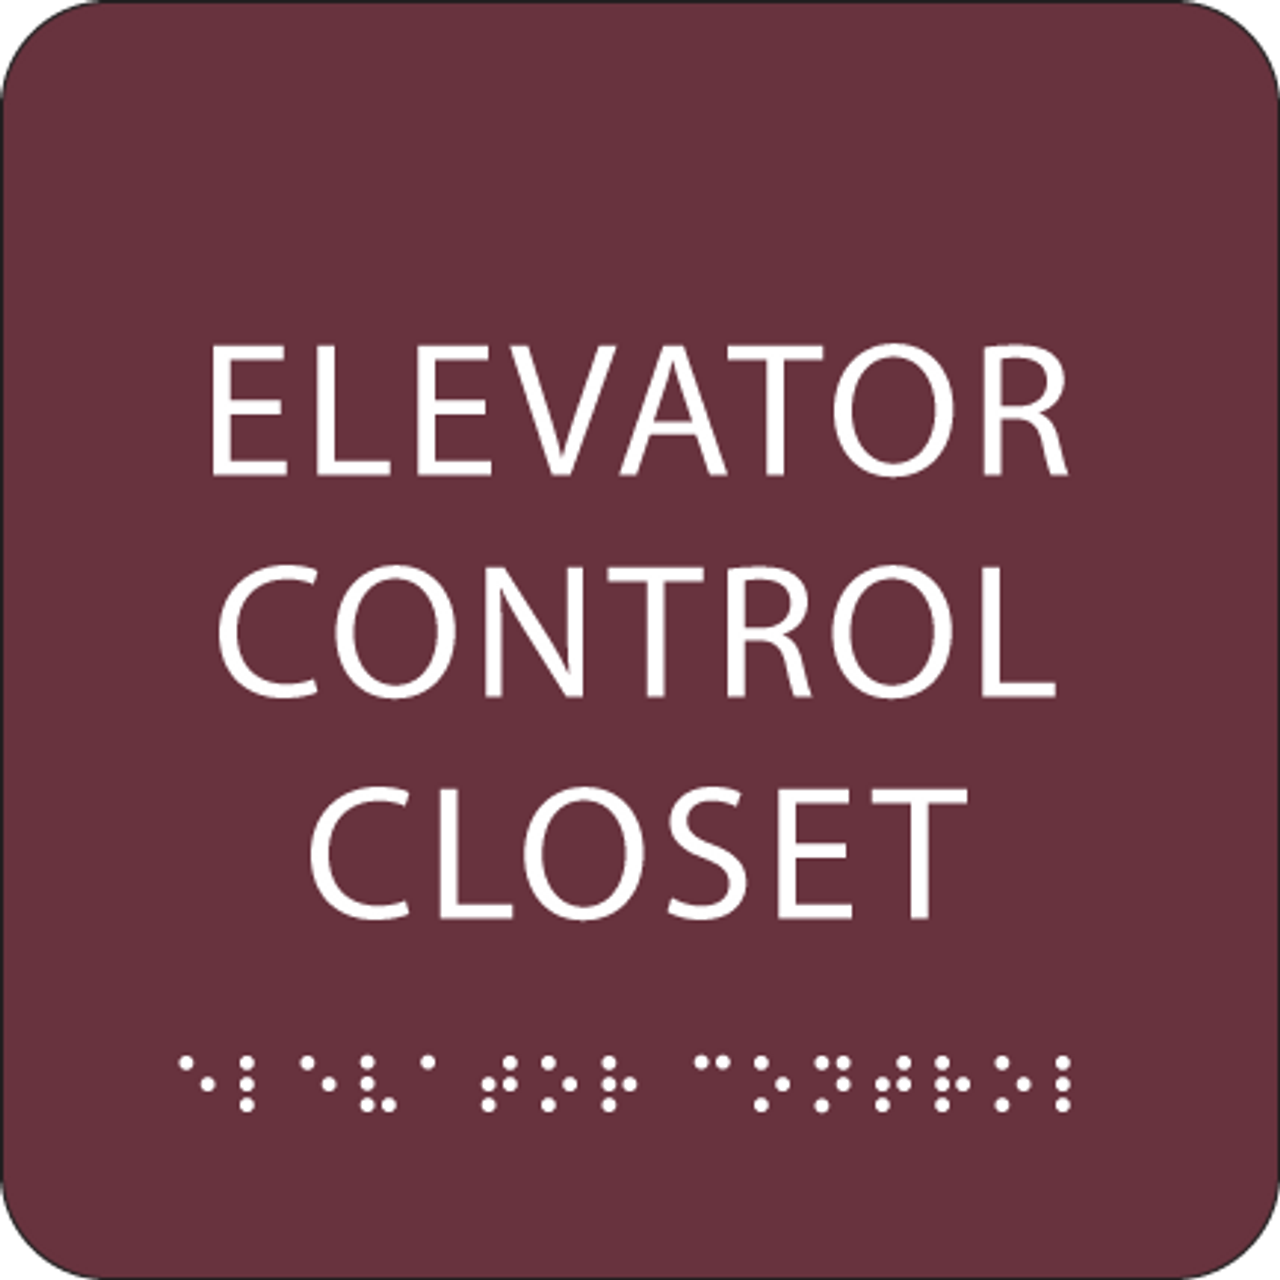 Burgundy Elevator Control Closet ADA Sign